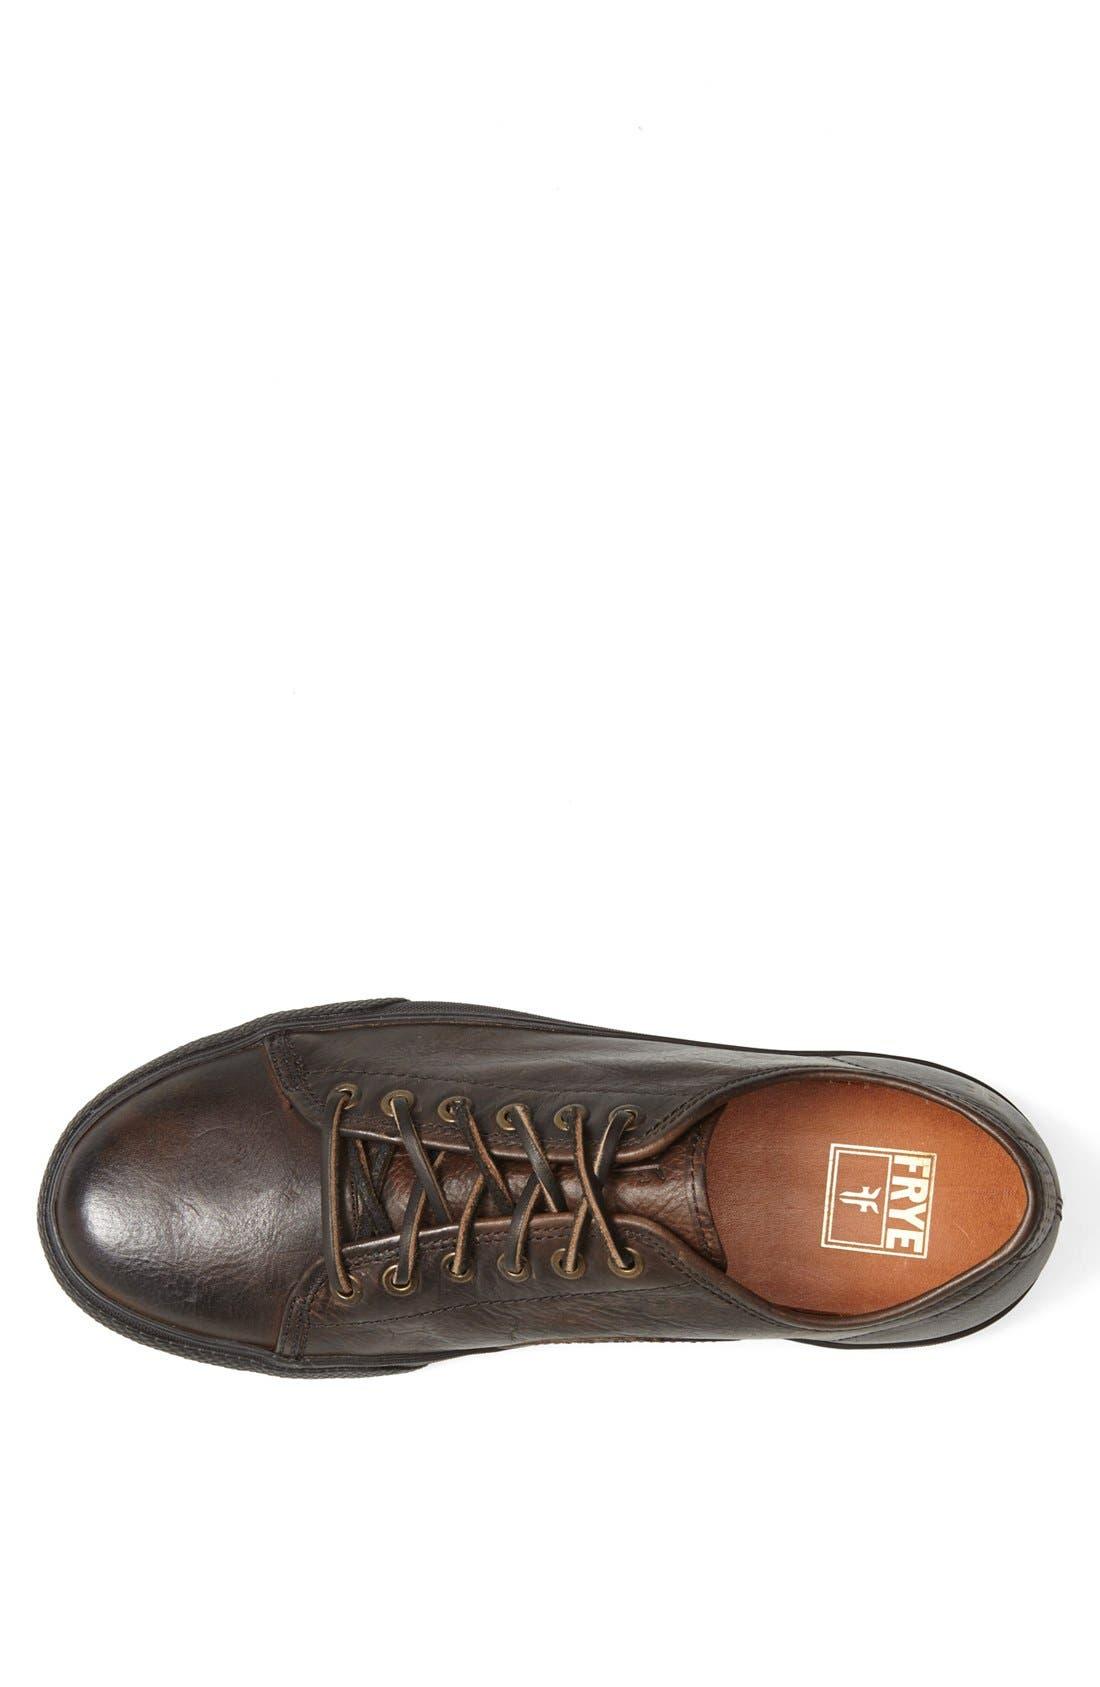 Alternate Image 3  - Frye 'Chambers Low' Sneaker